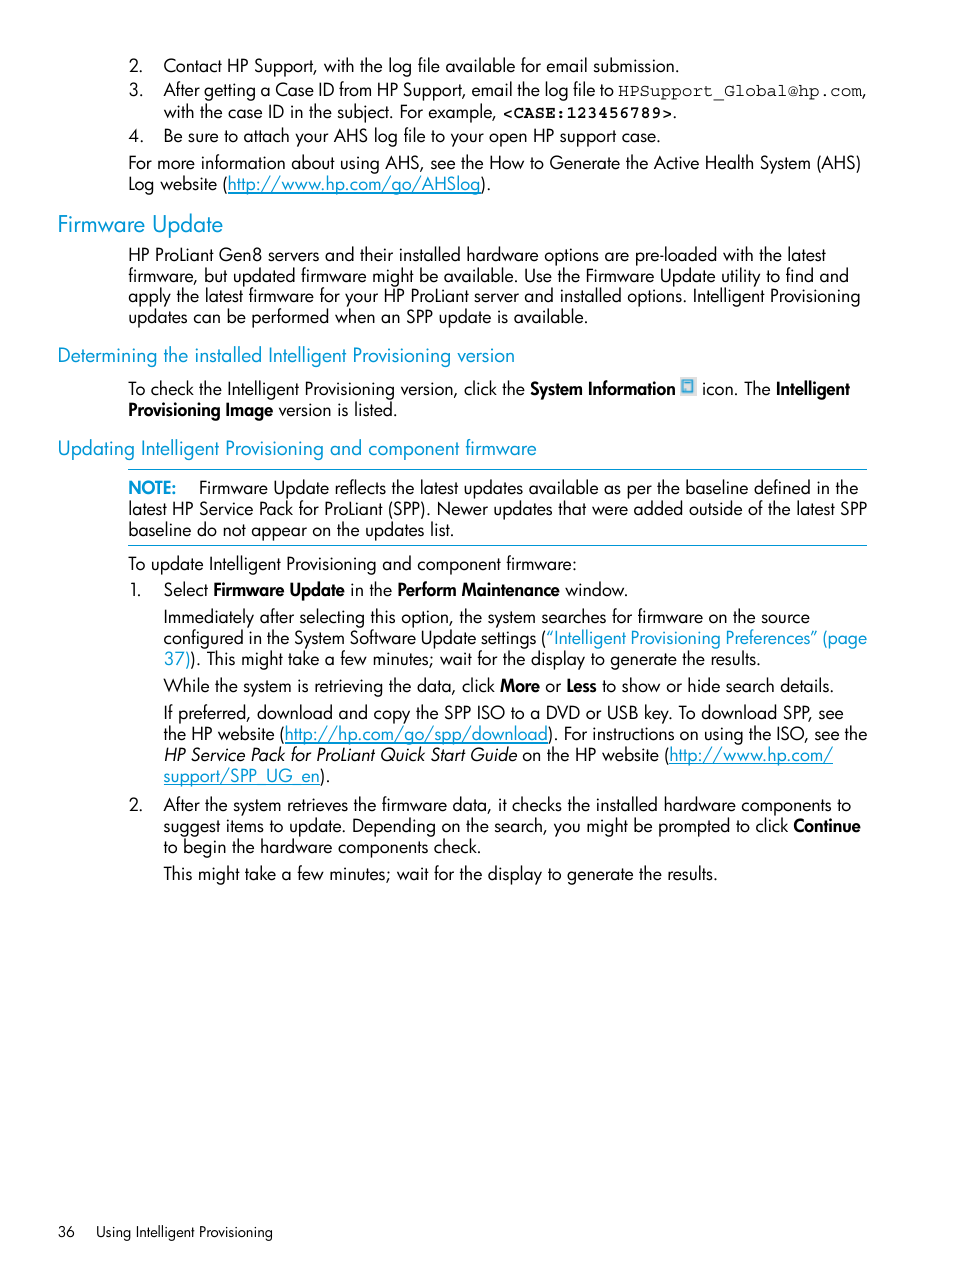 Firmware update | HP ProLiant DL320e Gen8 Server User Manual